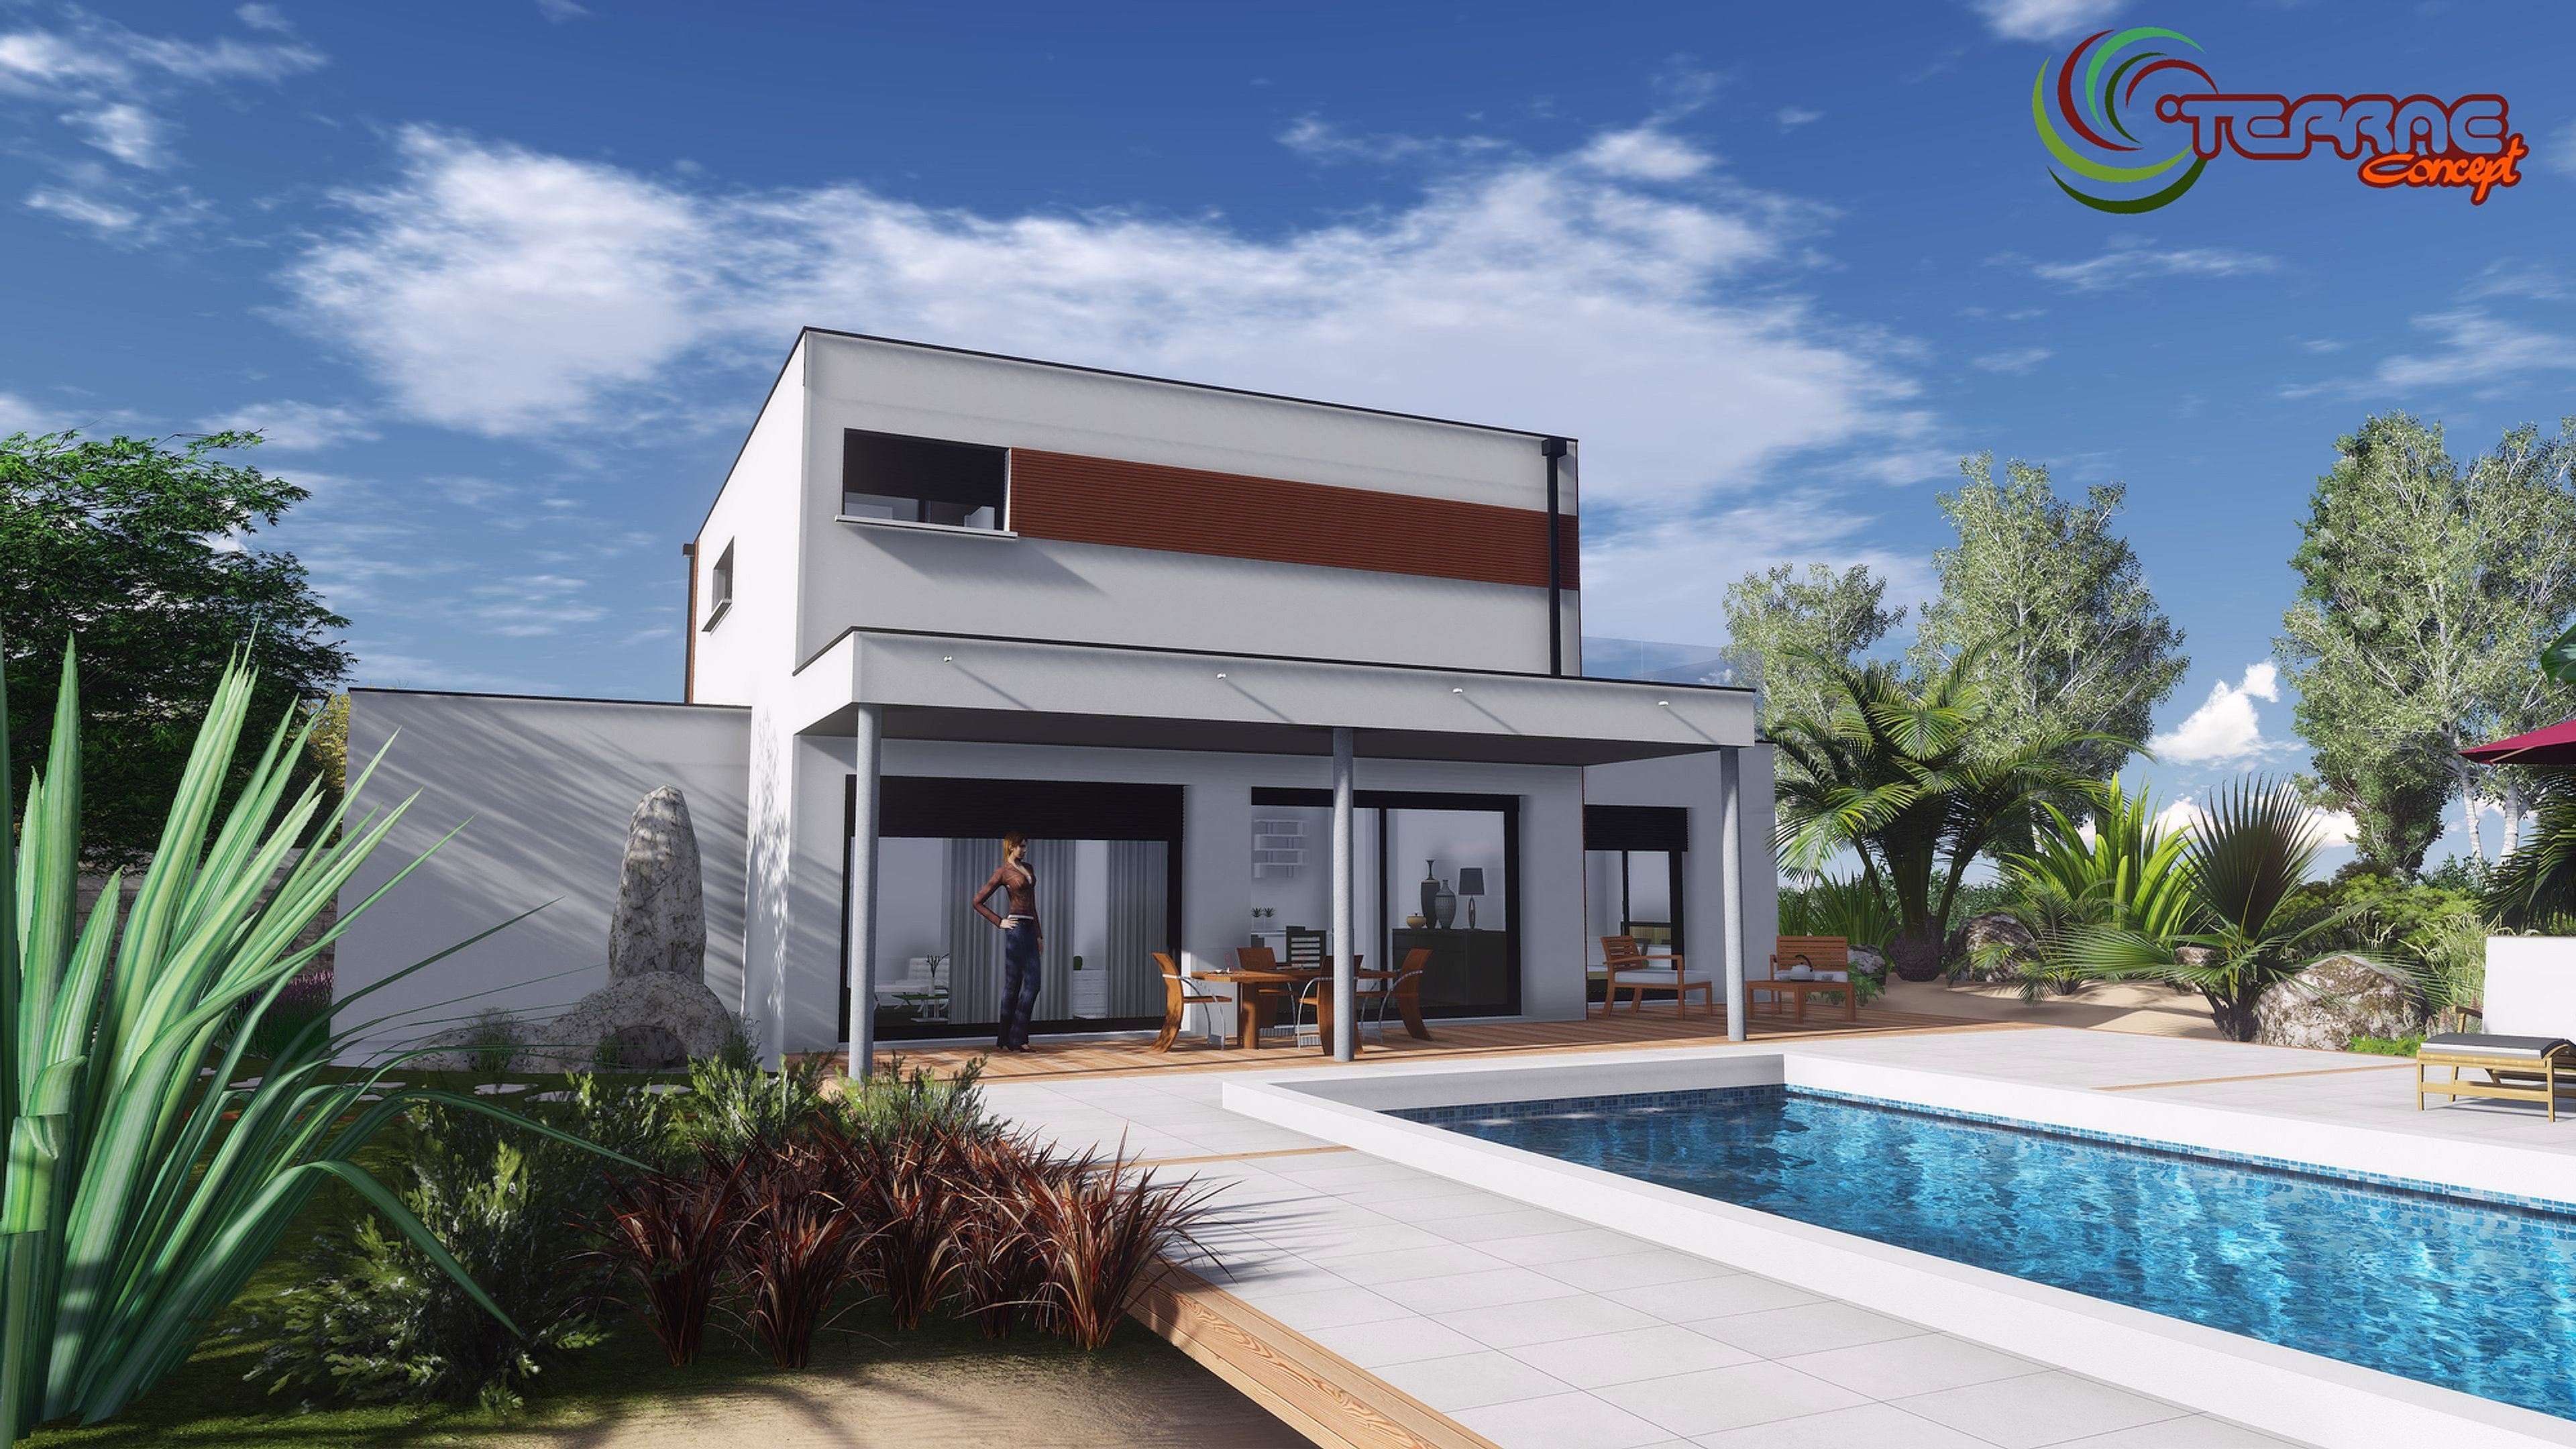 Plan permis de construire france christophe taurel - Permis construire piscine ...